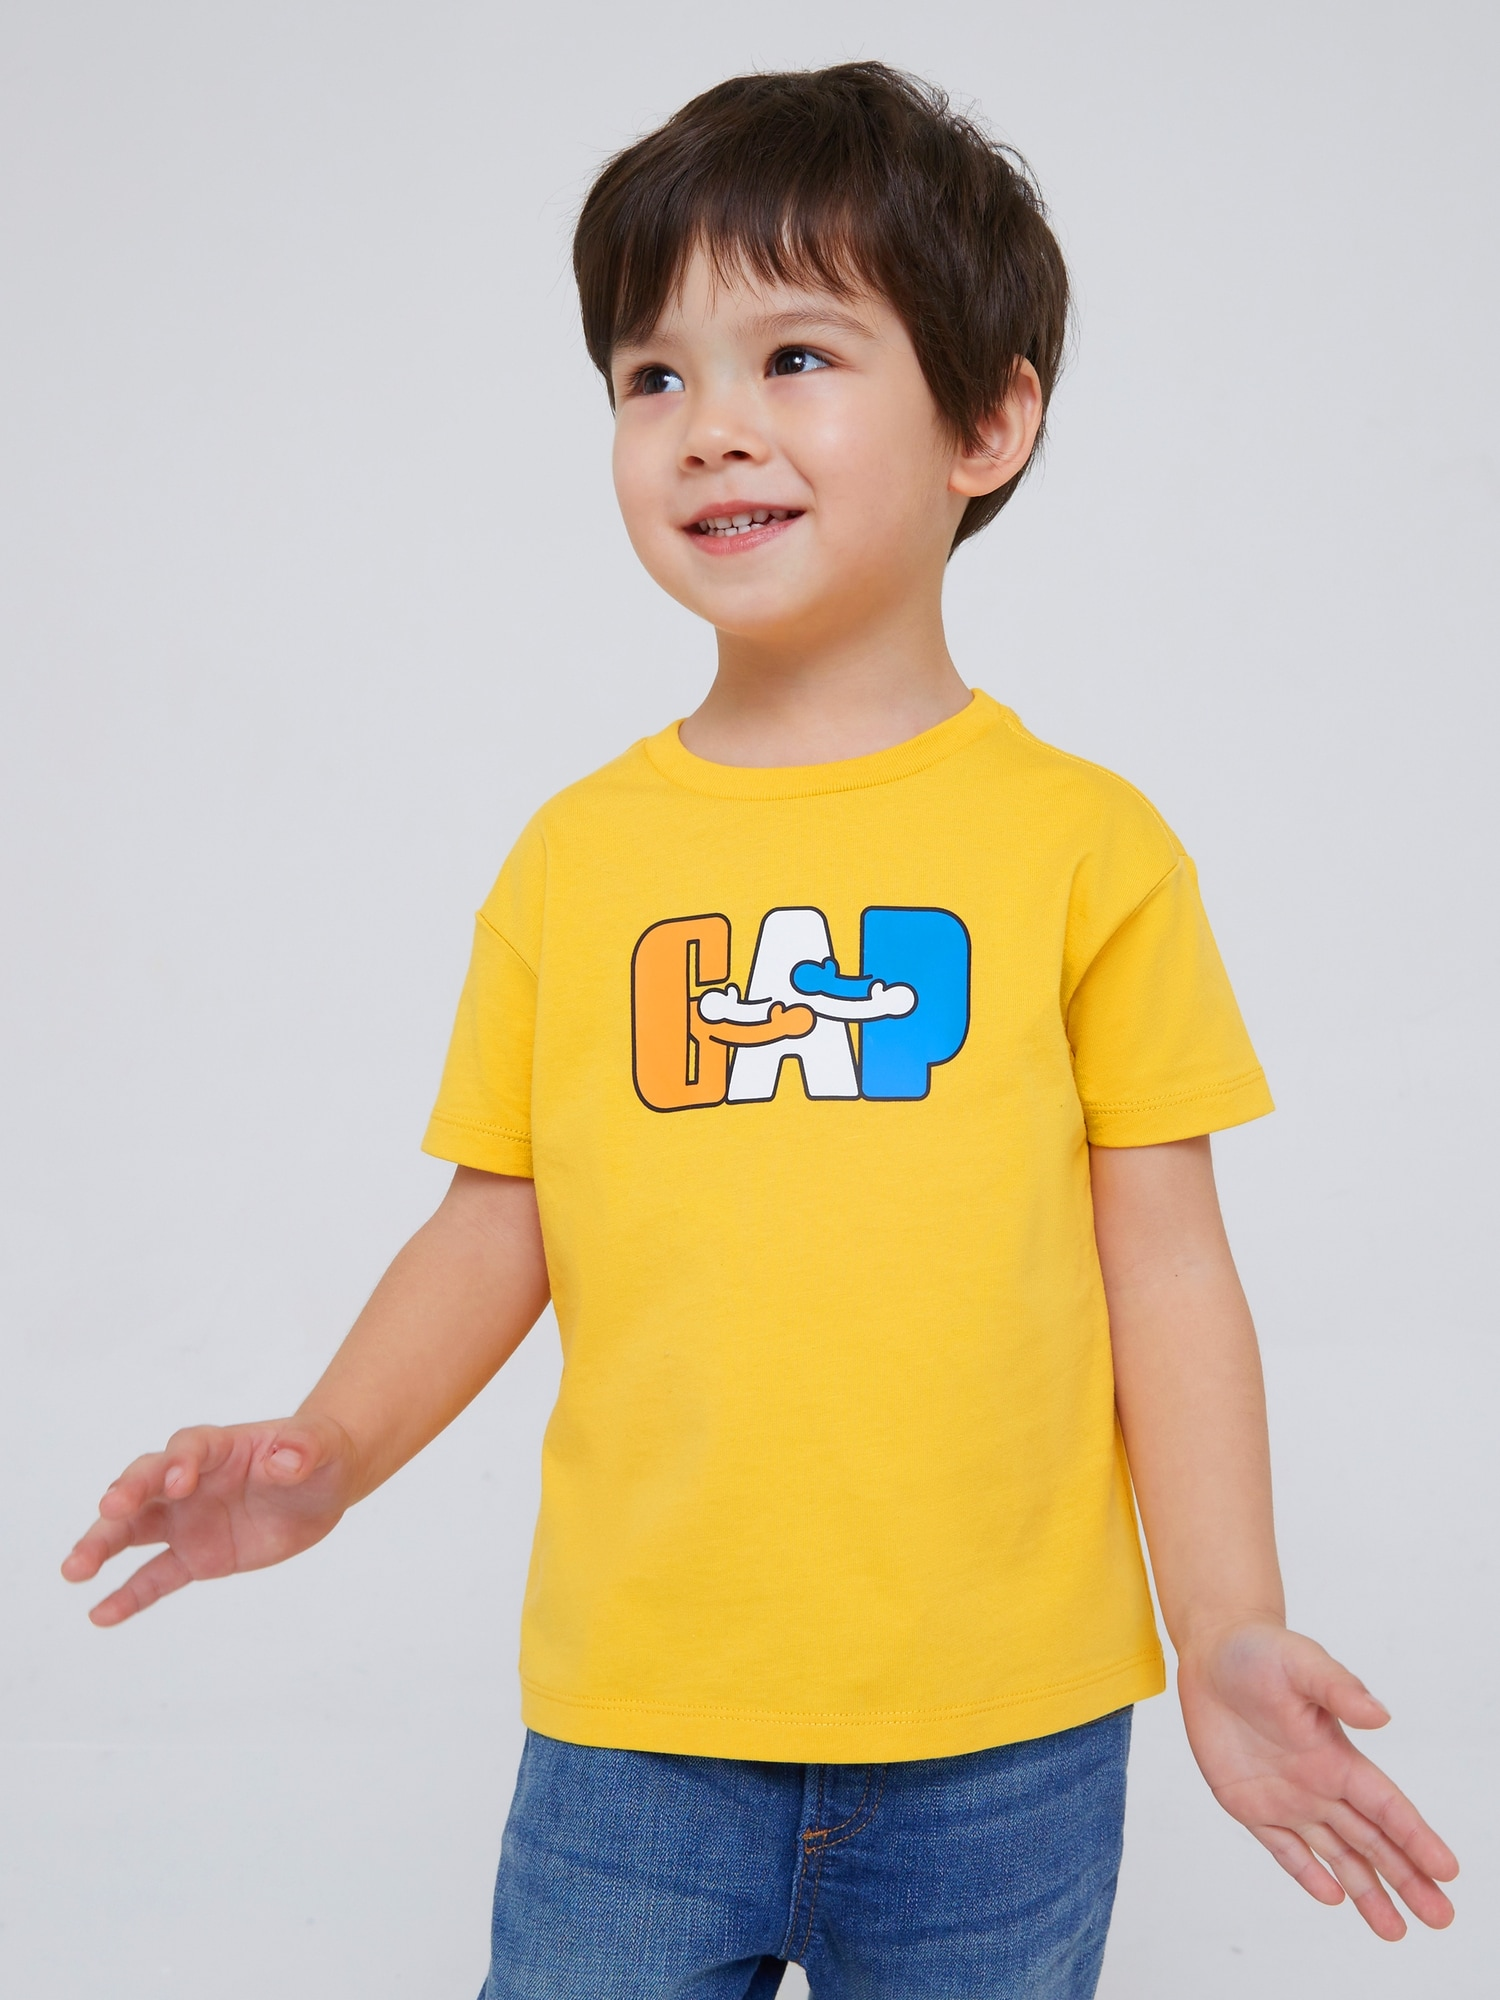 Kenloコレクション クルーネックtシャツ (幼児・ユニセックス)